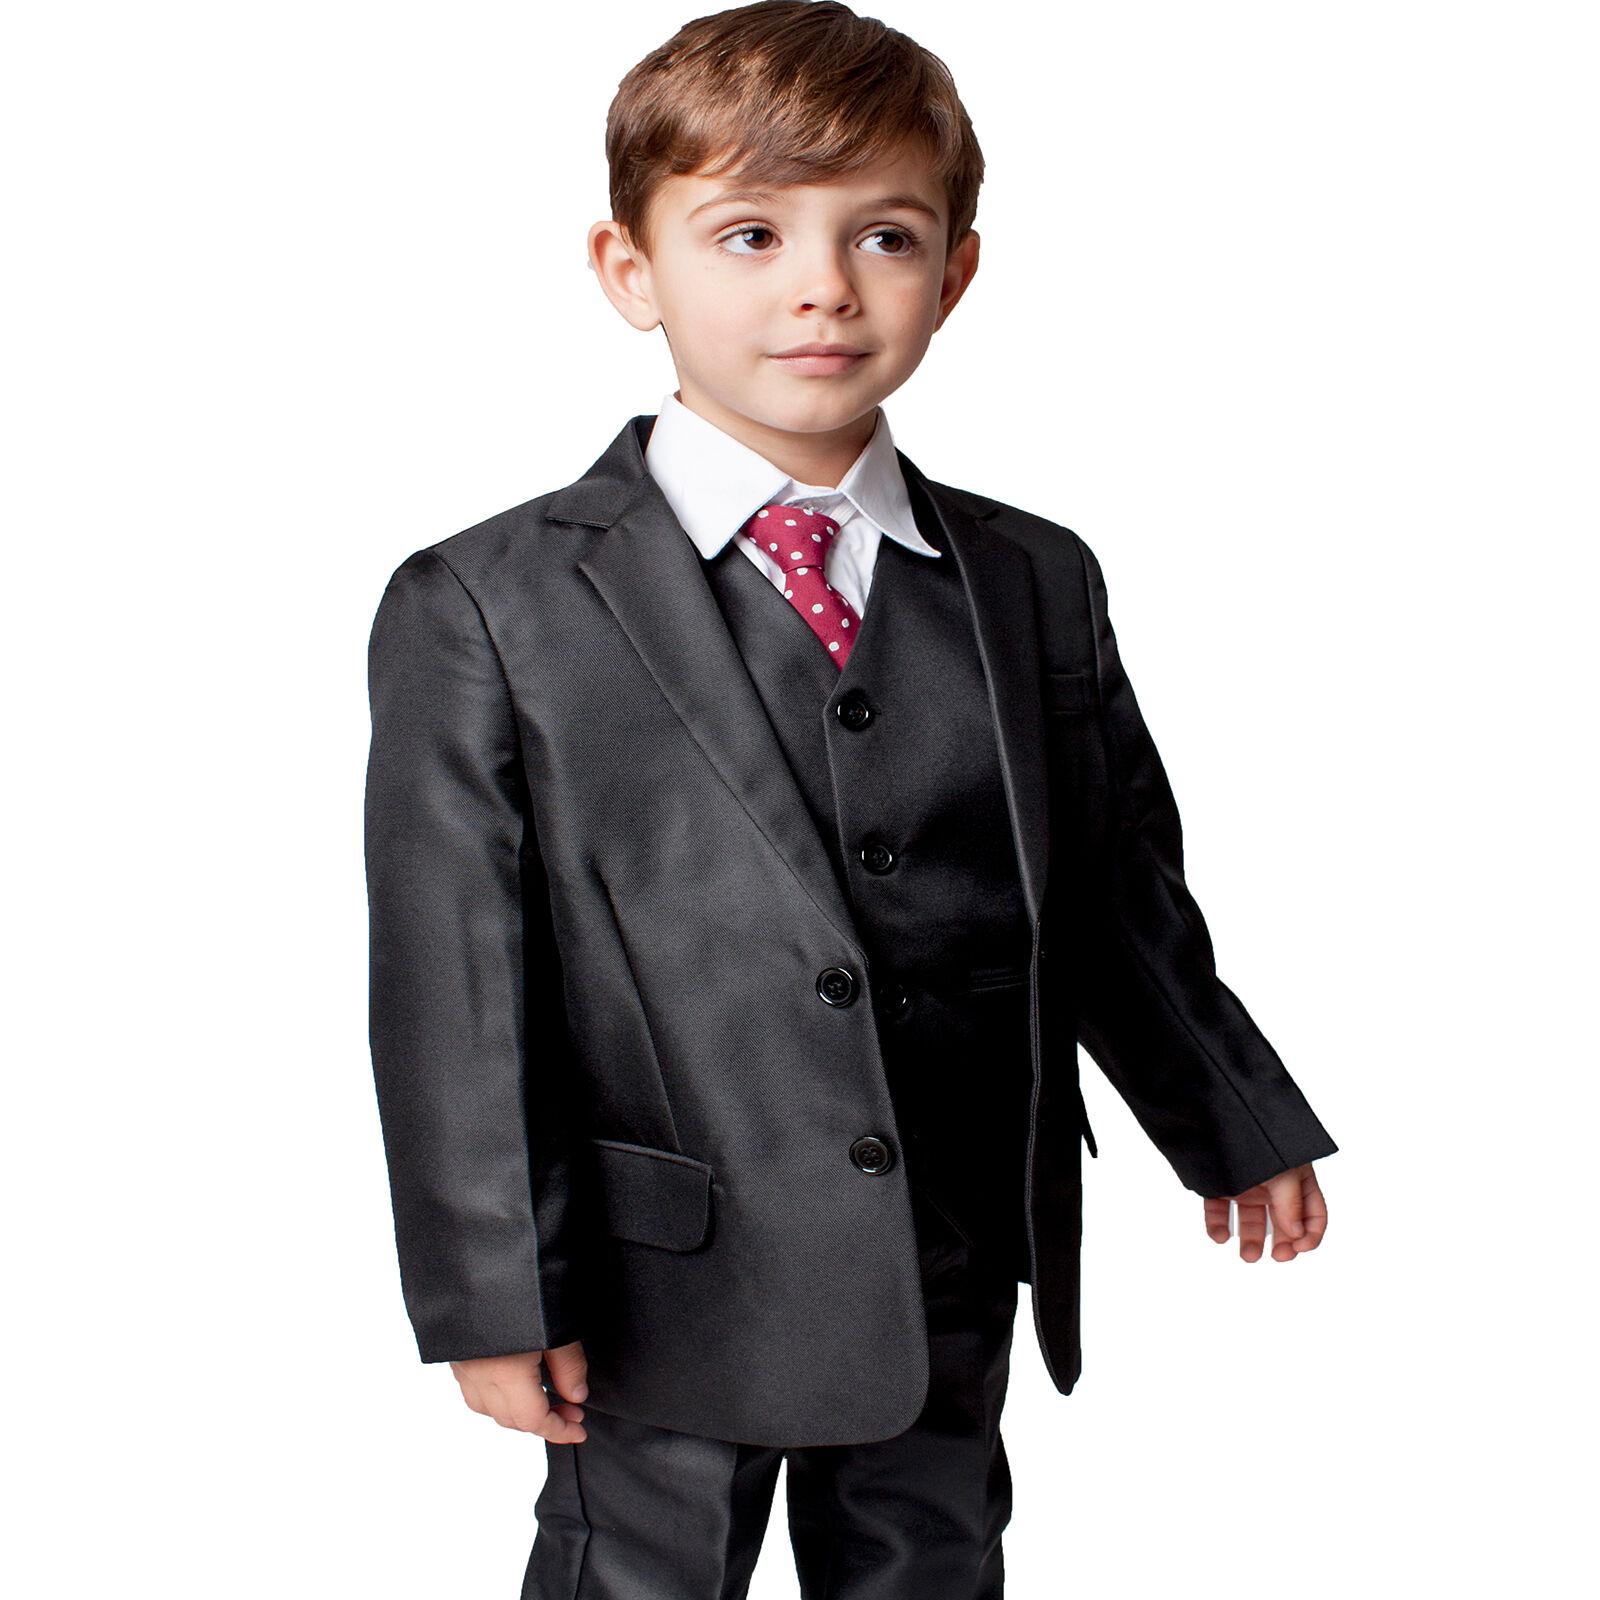 4c251ad0d Details about Boys Suits Boys Black Suit 5 Piece Wedding Party Formal Outfit  (0-3M - 14Yrs)